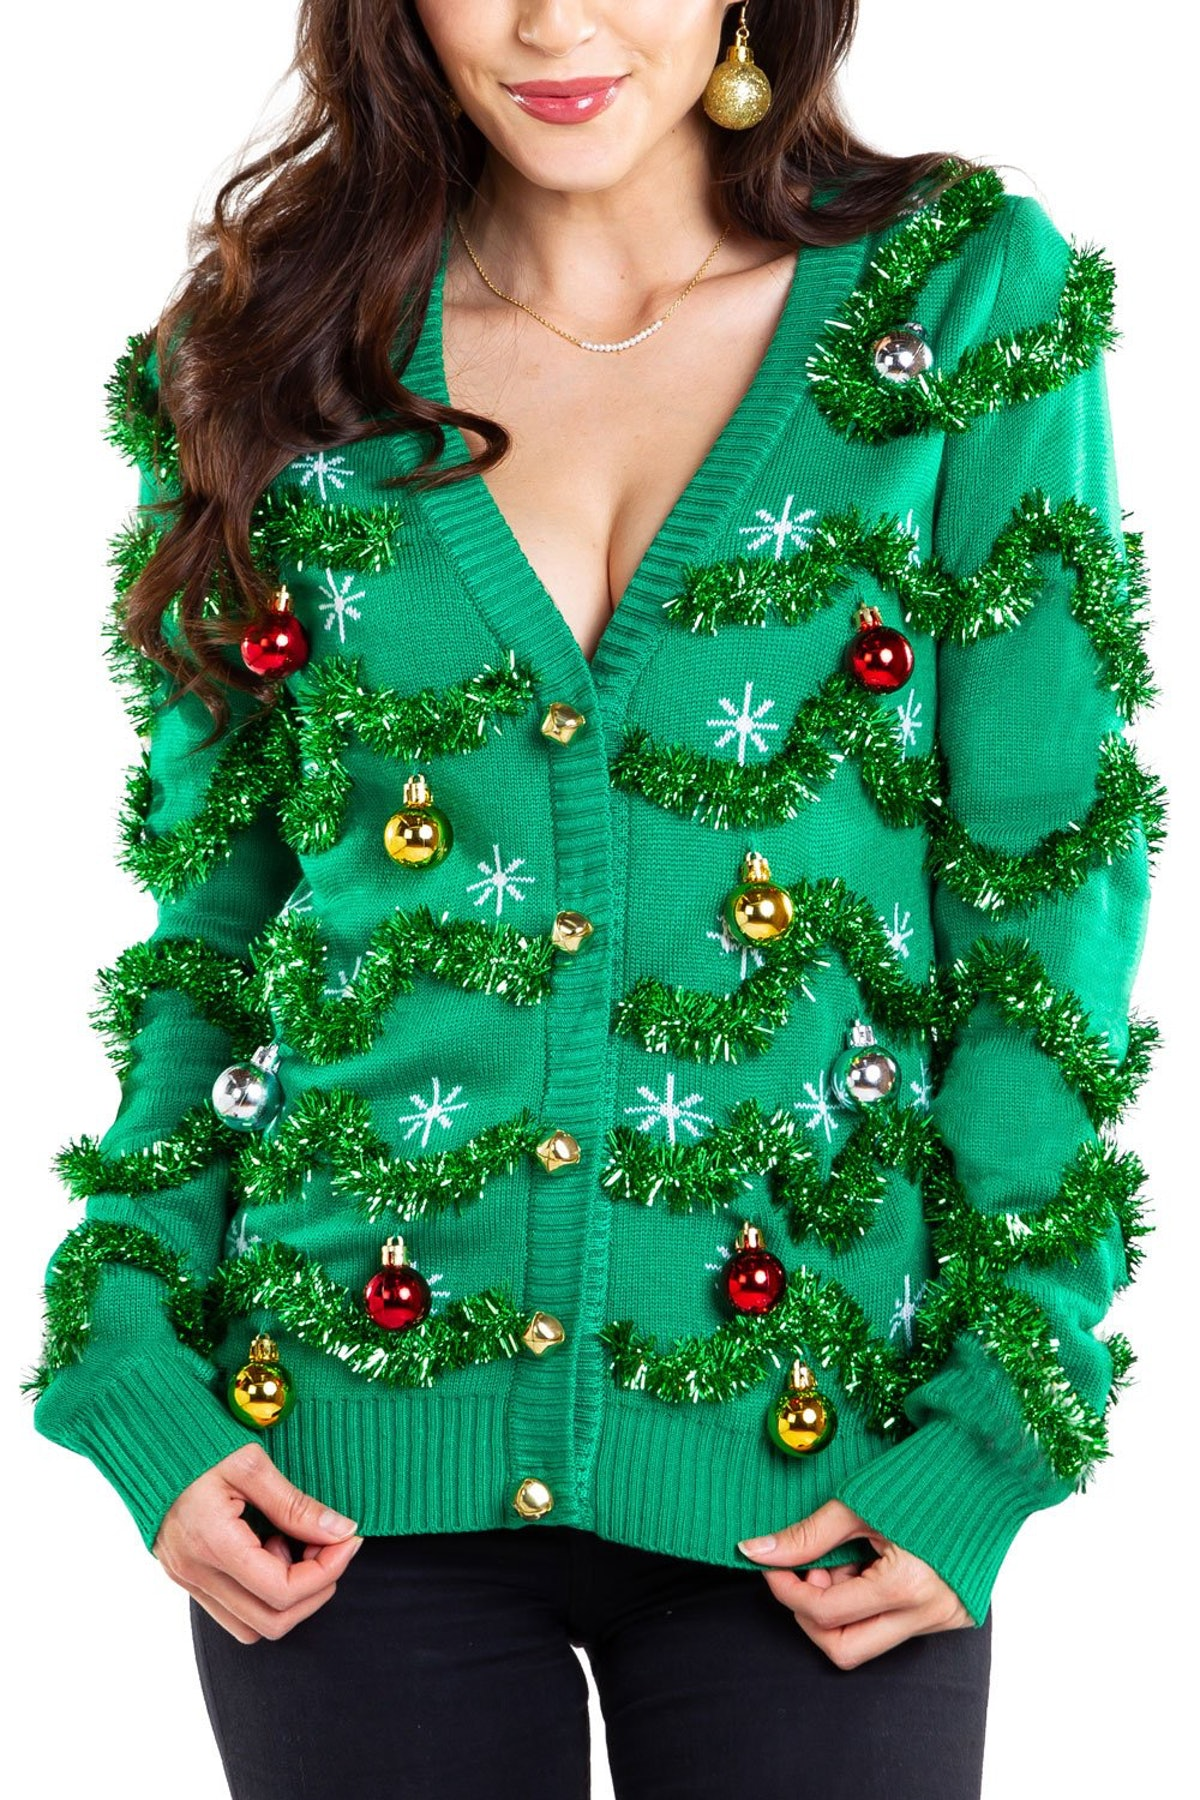 Women's Gaudy Garland Ugly Christmas Cardigan